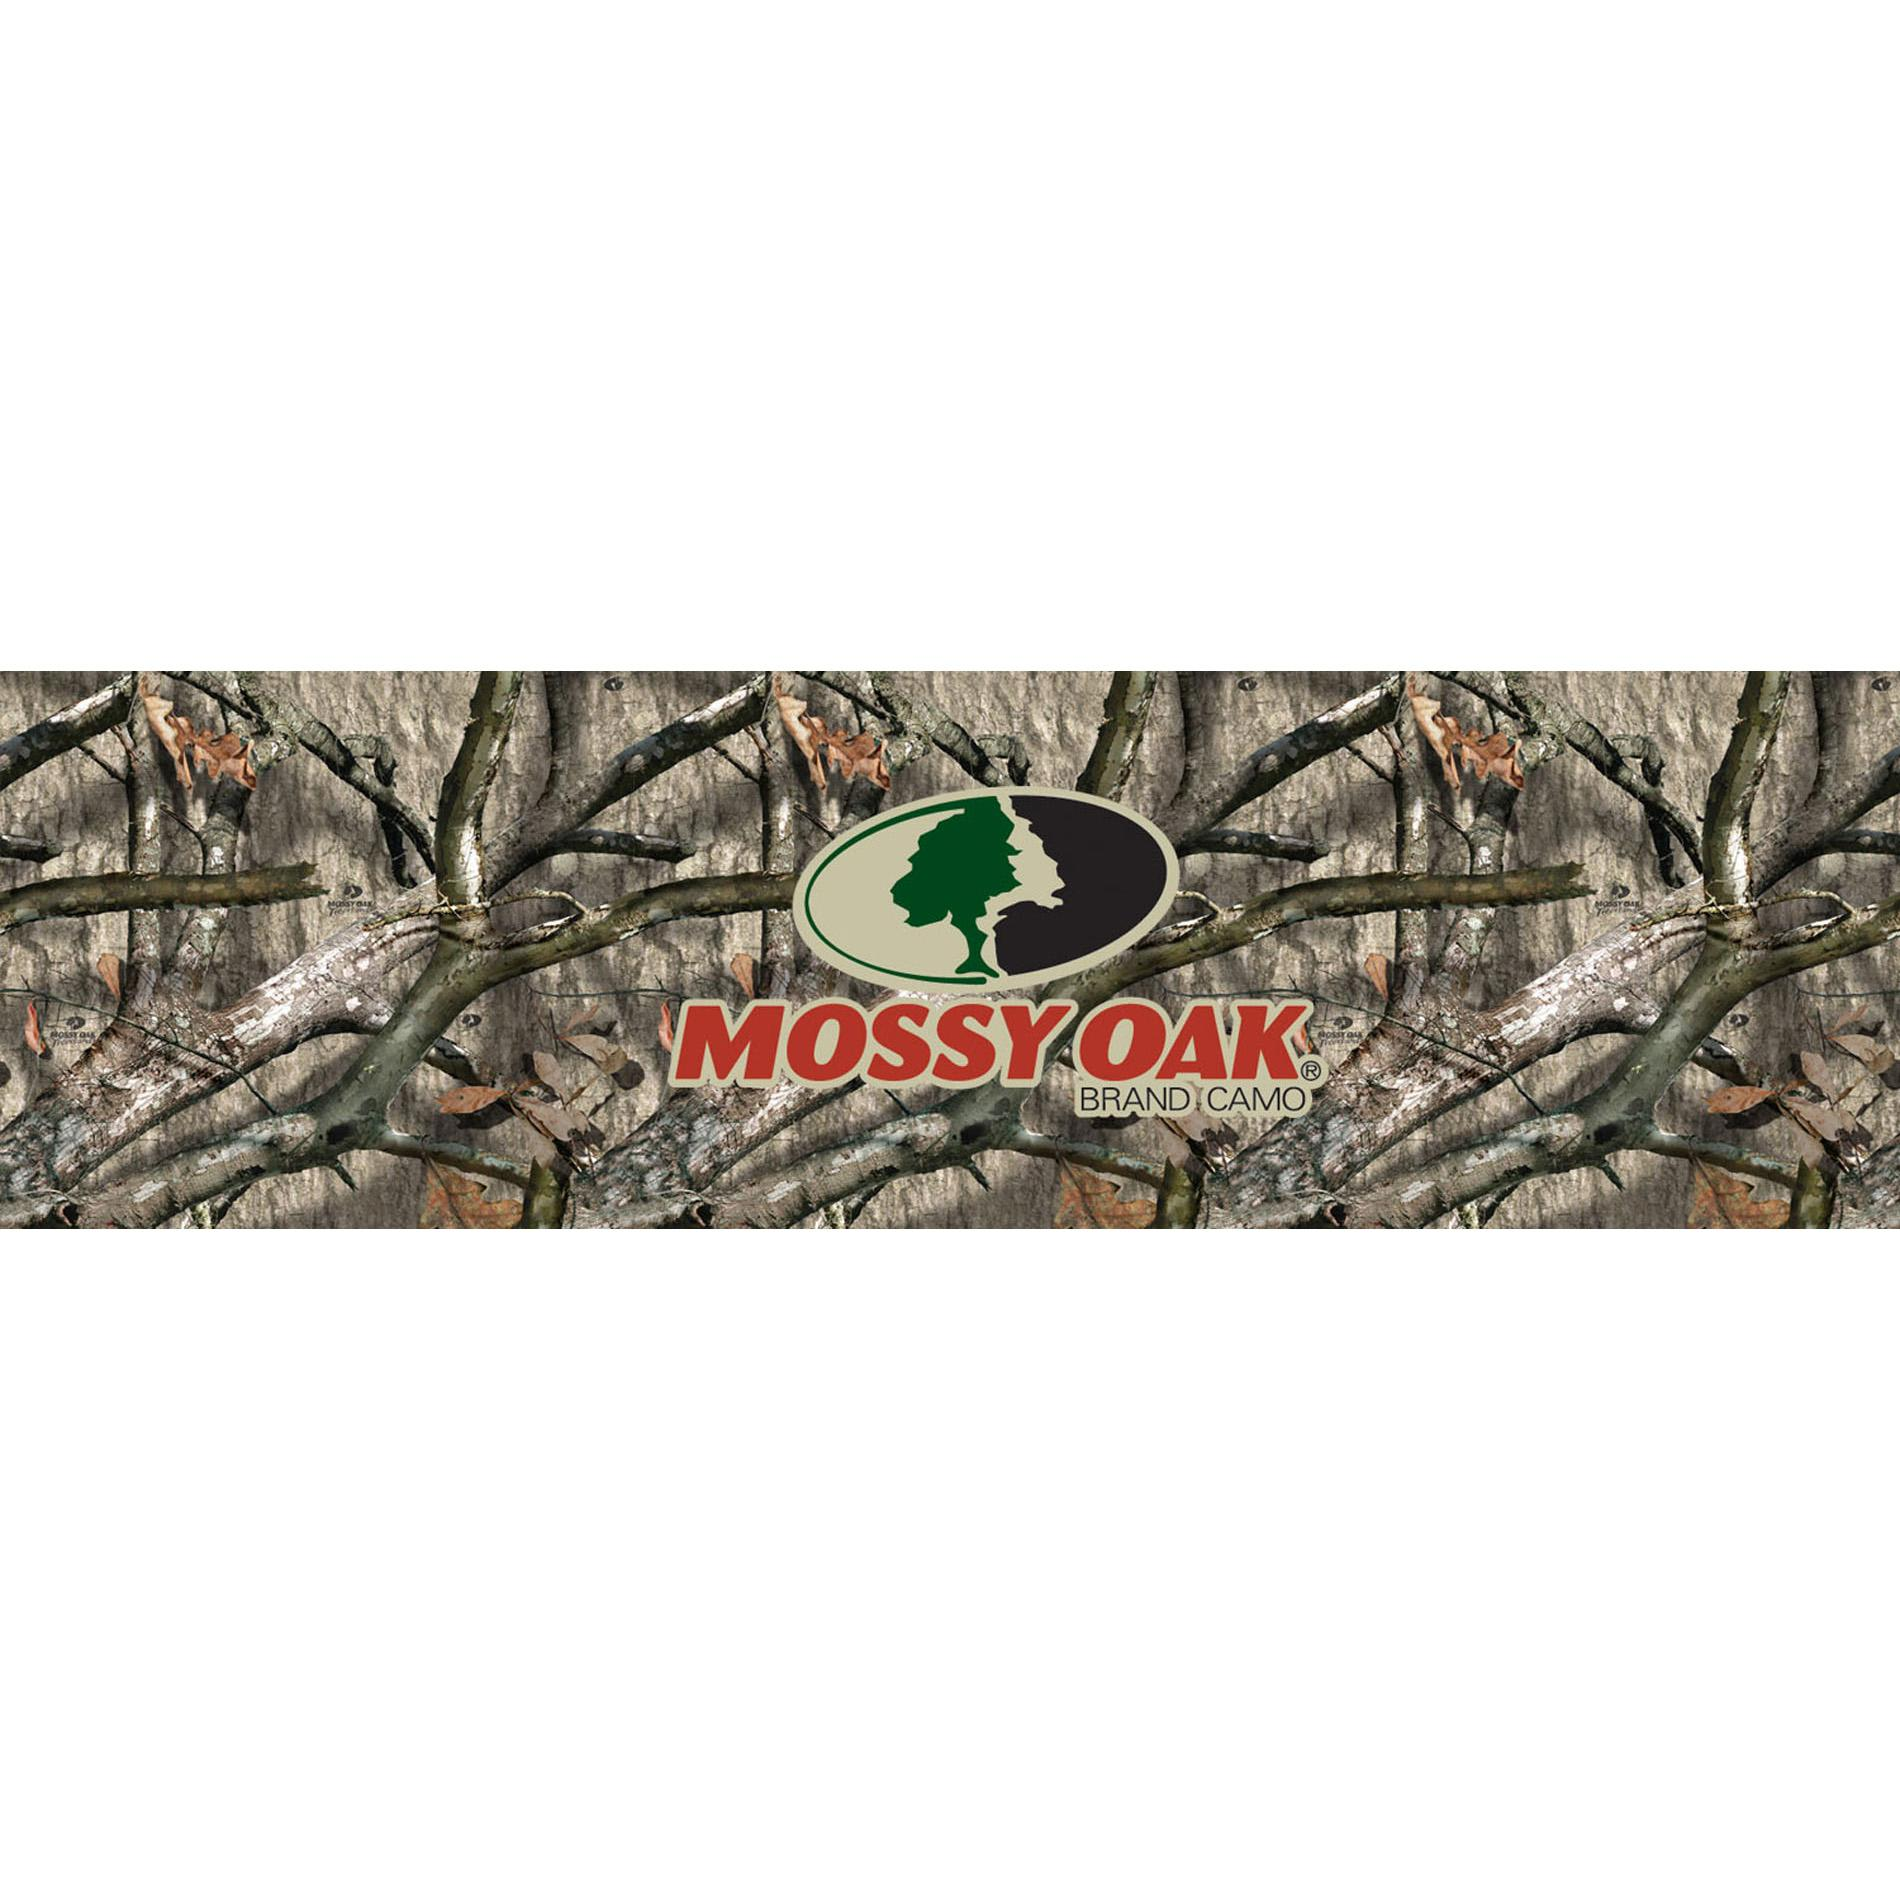 Mossy Oak Infinity Camo Full Size Tailgate Logo Graphic - Thumbnail 2